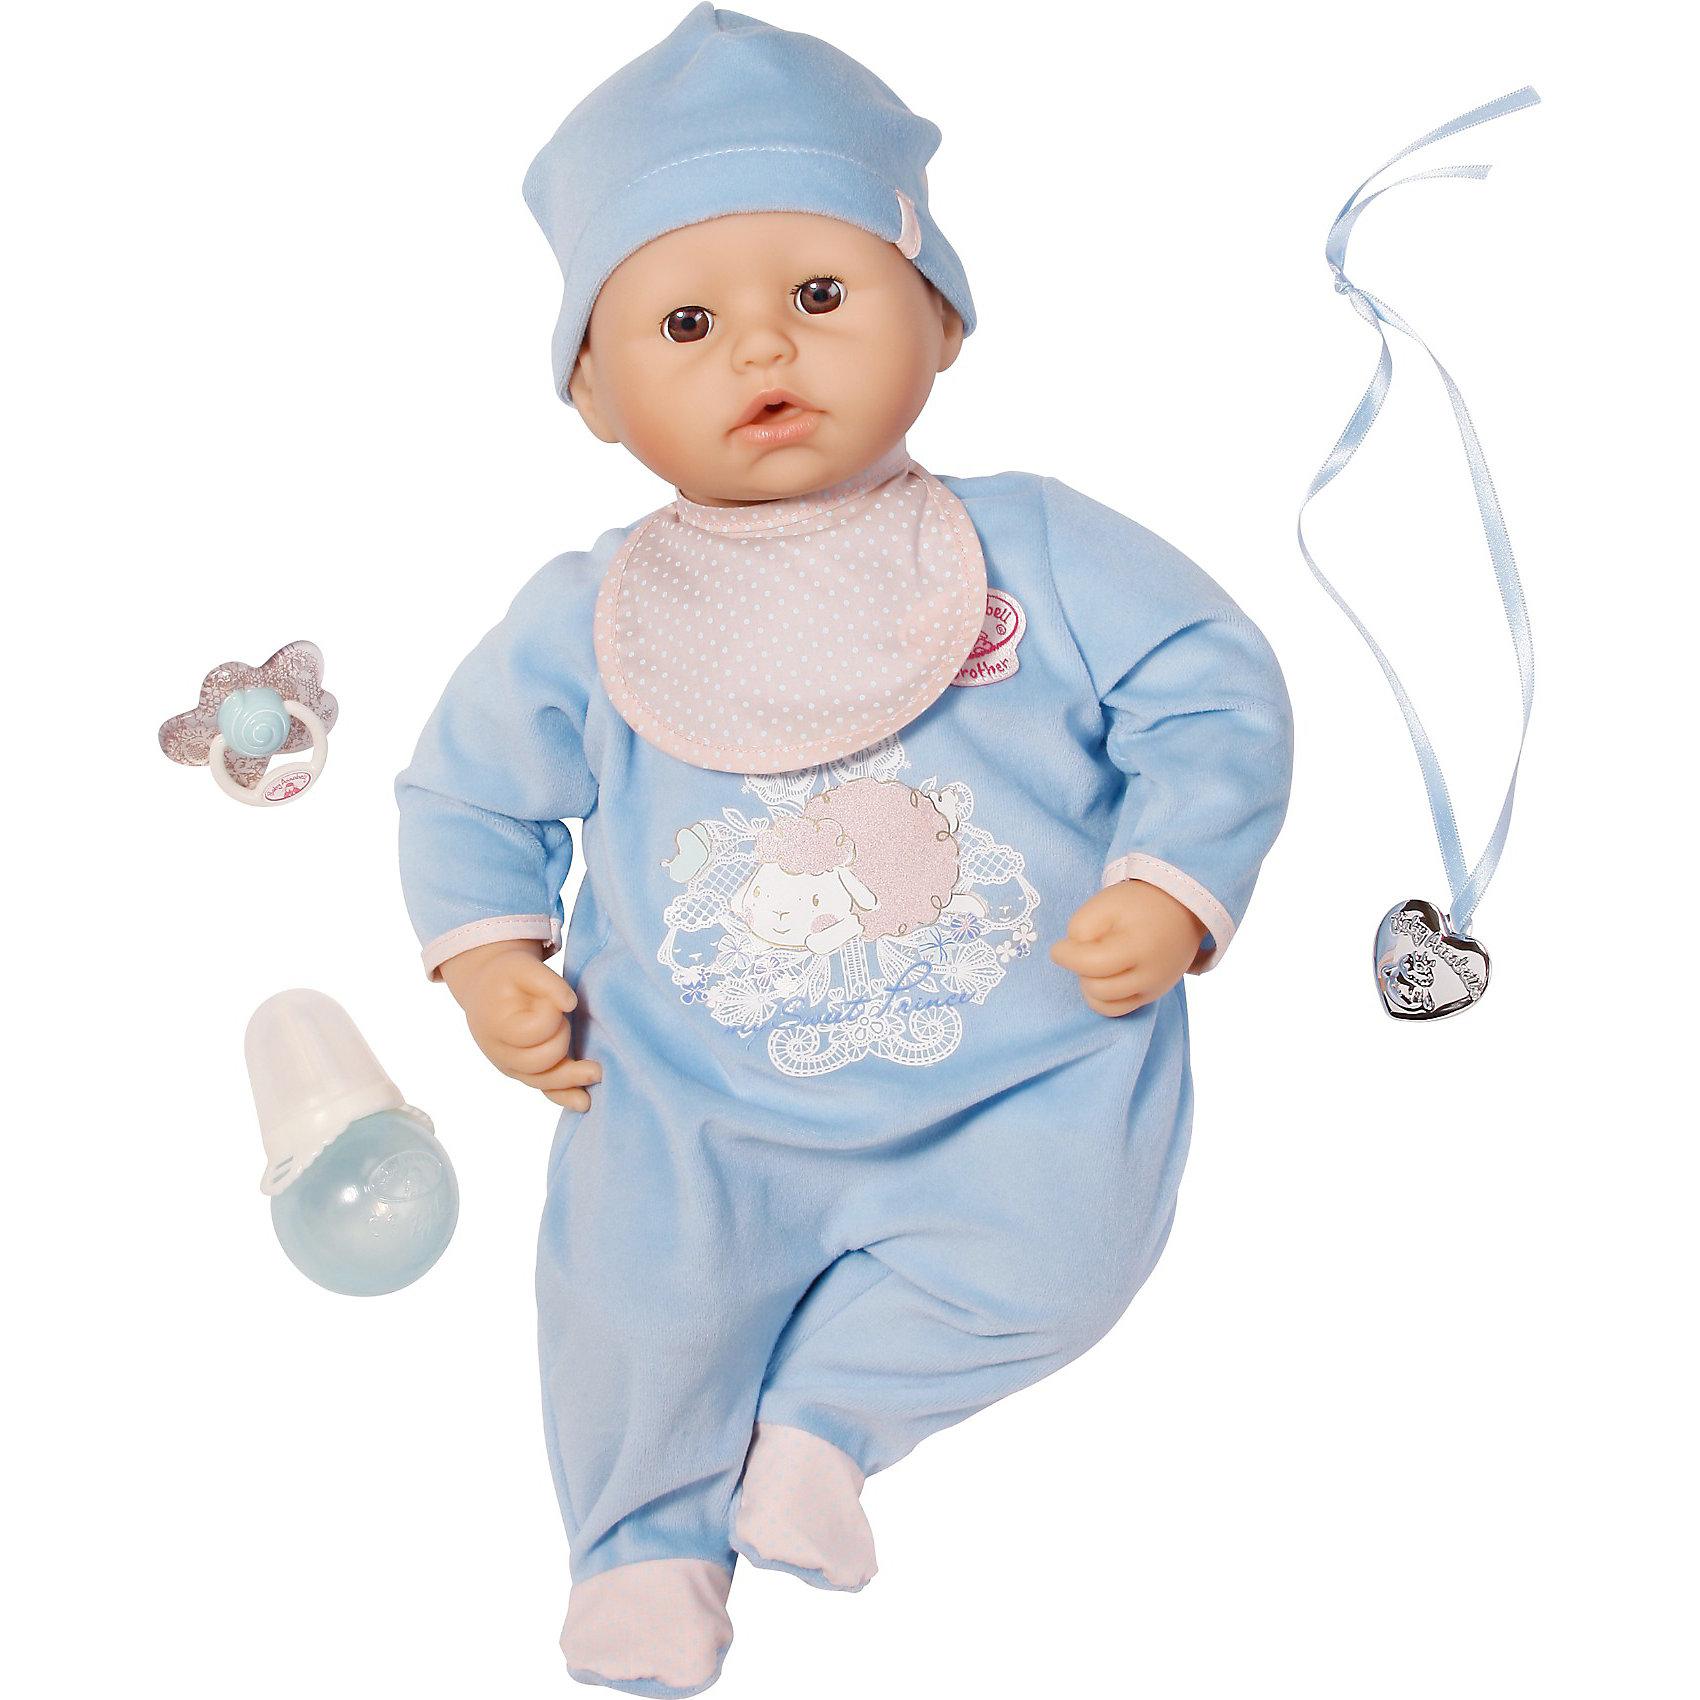 Кукла-мальчик с мимикой, 46 см,  Baby Annabell